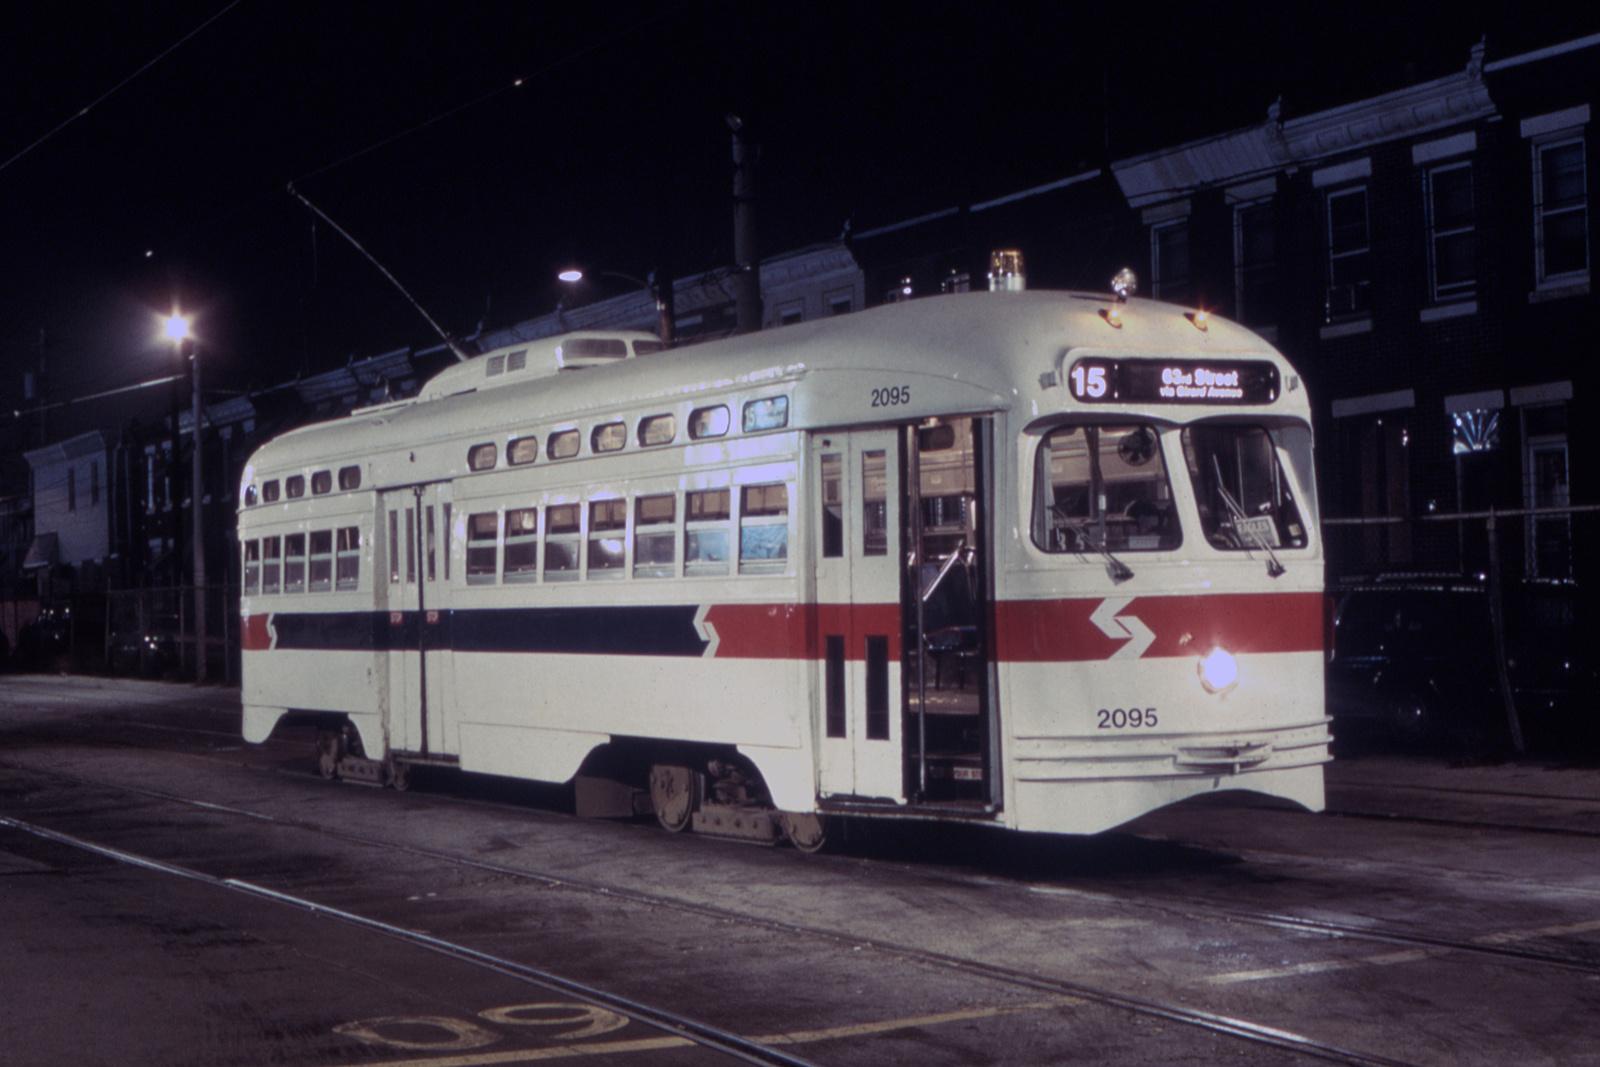 (101k, 1008x668)<br><b>Country:</b> United States<br><b>City:</b> Philadelphia, PA<br><b>System:</b> SEPTA (or Predecessor)<br><b>Line:</b> Rt. 15-Girard<br><b>Location:</b> Richmond/Westmoreland <br><b>Car:</b> PTC/SEPTA Postwar All-electric PCC (St.Louis, 1948)  2095 <br><b>Photo by:</b> Glenn L. Rowe<br><b>Date:</b> 9/4/1992<br><b>Viewed (this week/total):</b> 4 / 11956